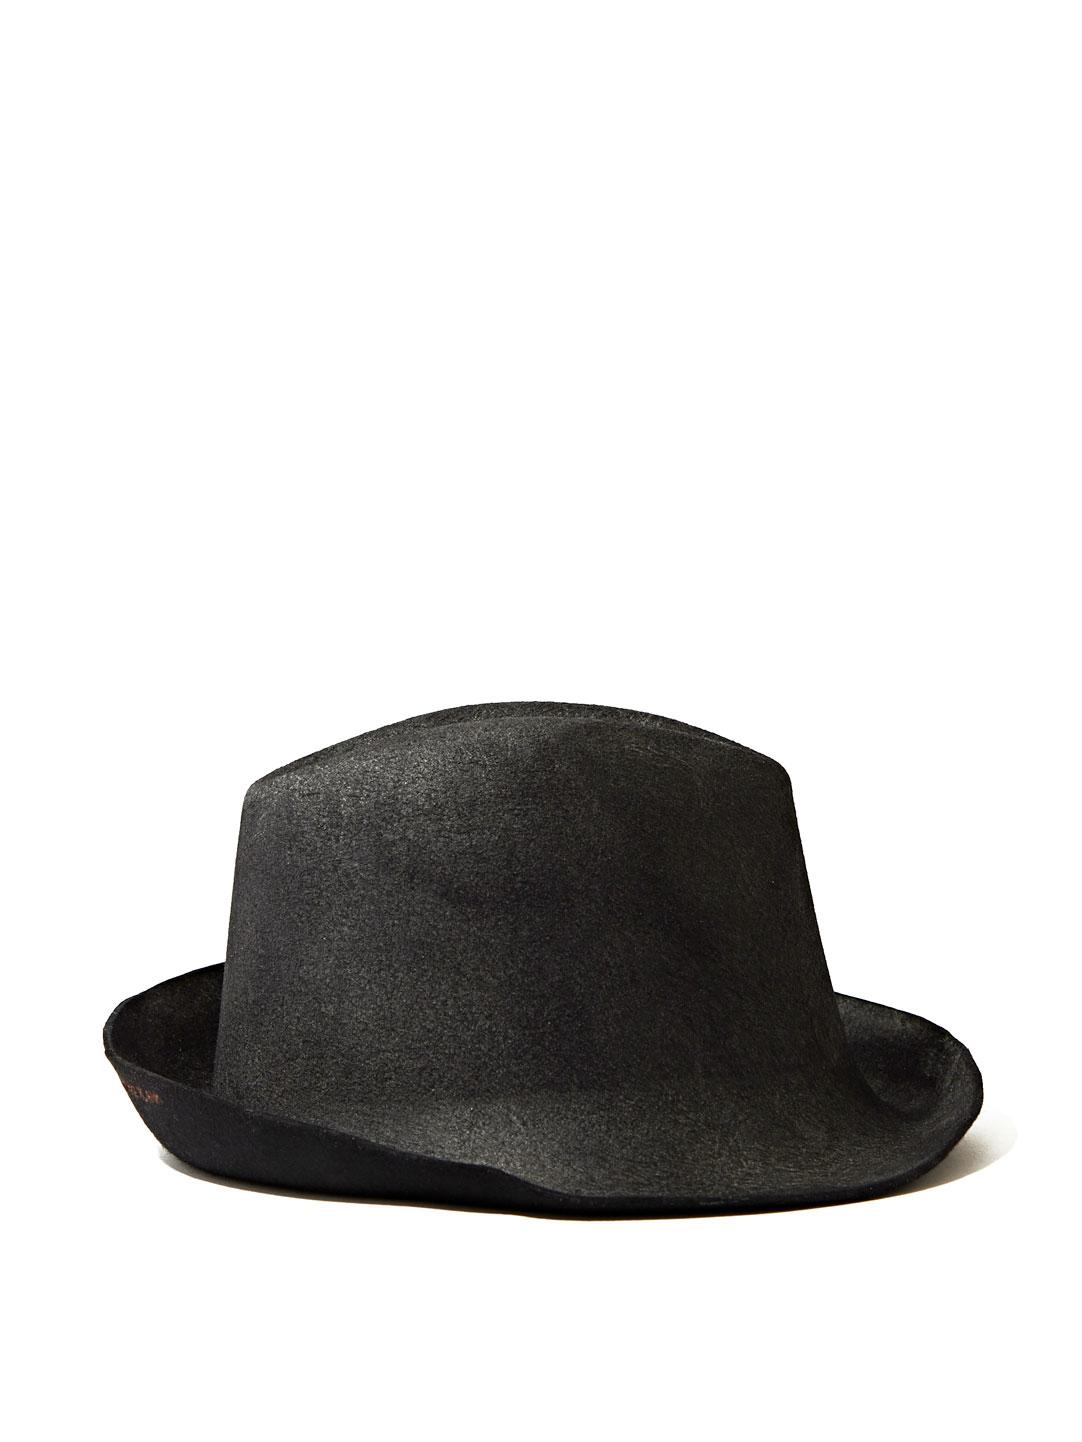 bc949a2ac1d Reinhard Plank Mens Ribelle Hat